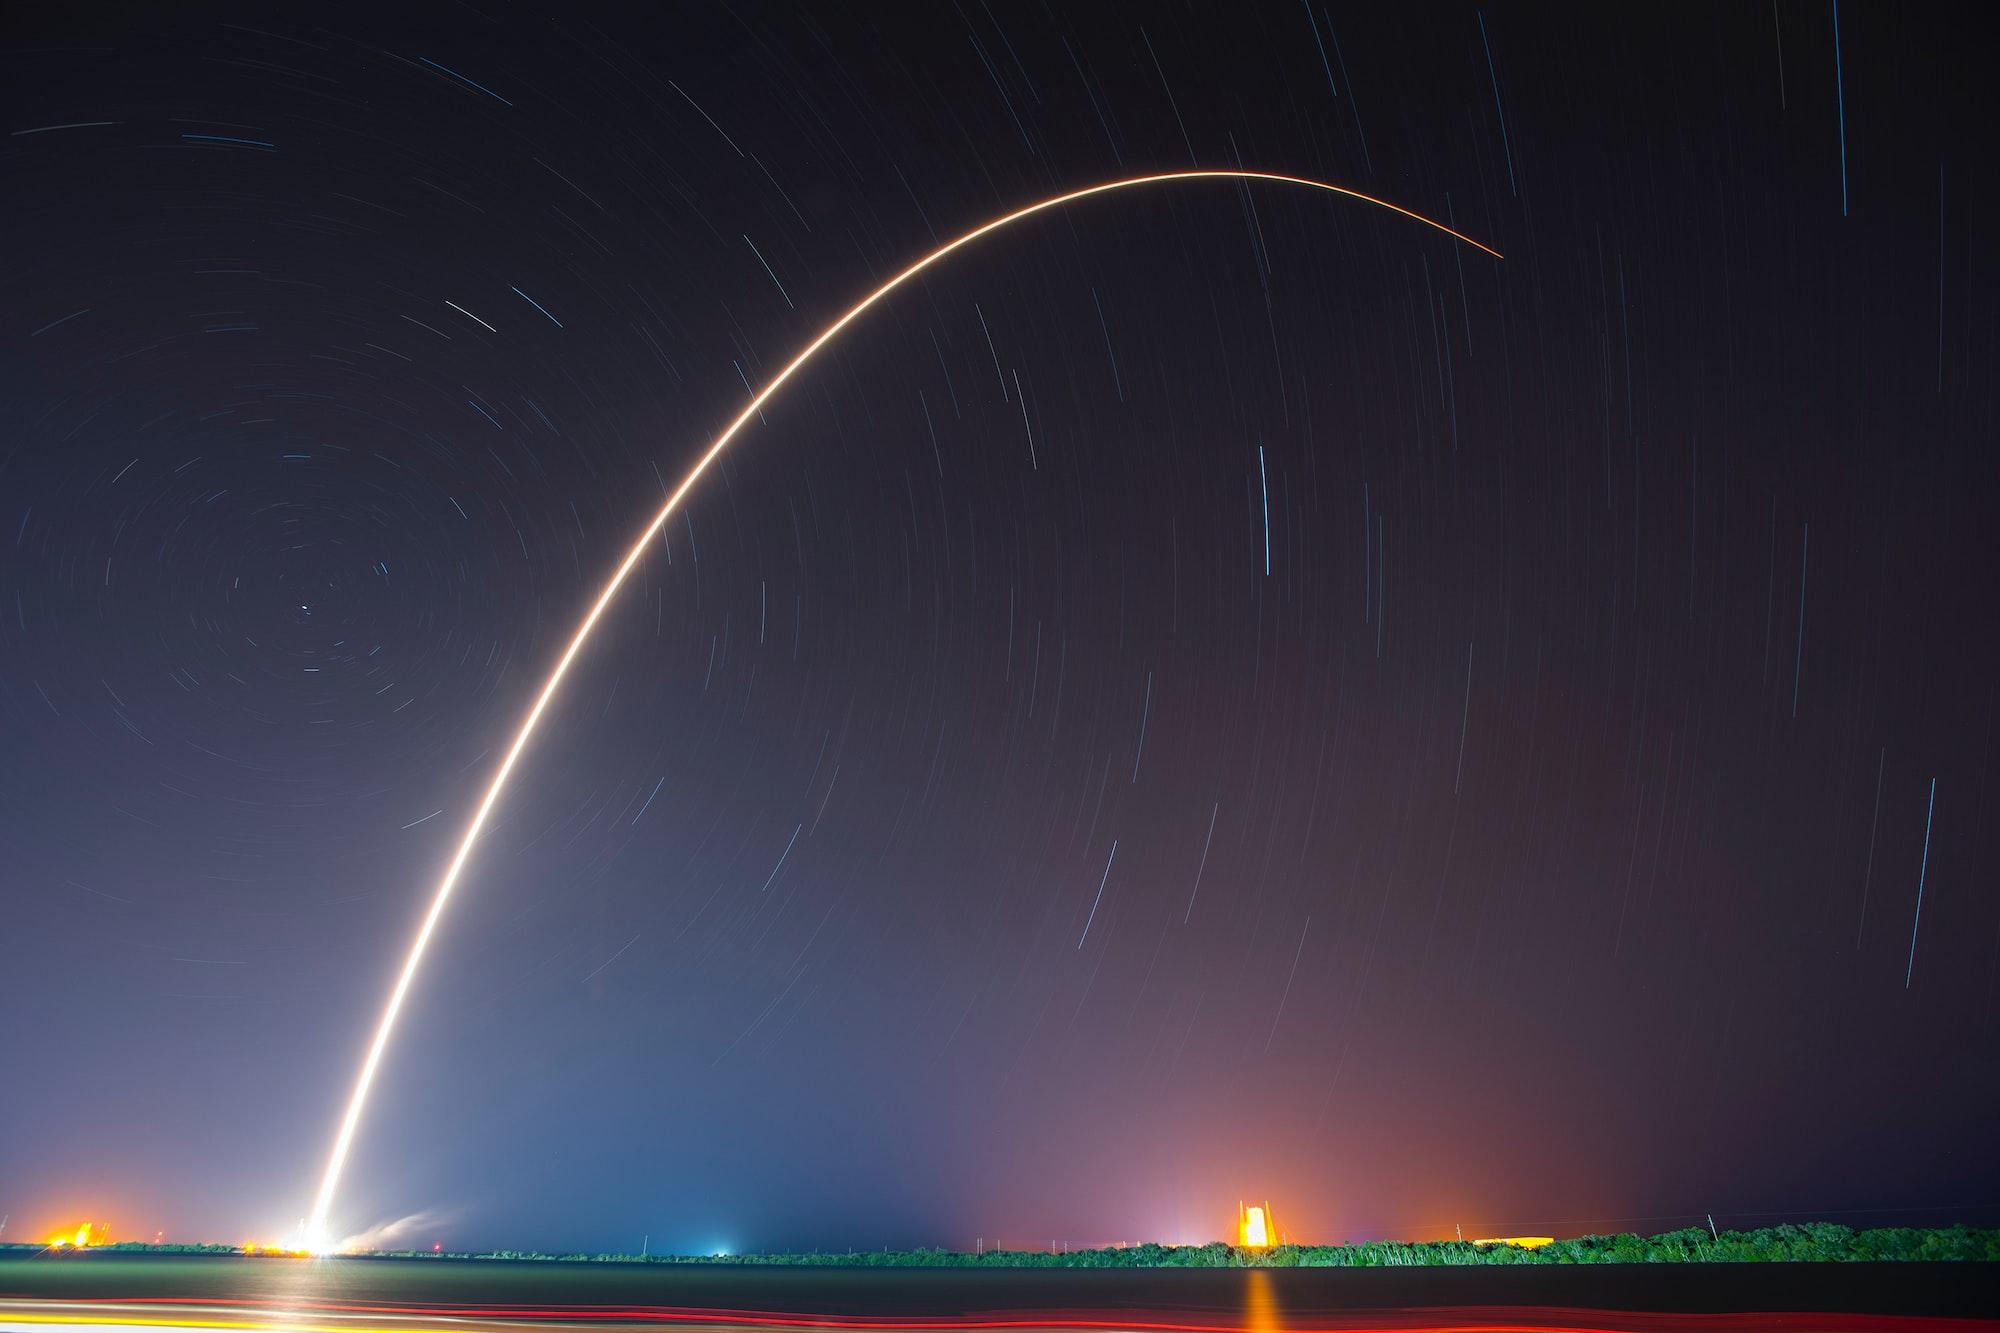 Congratulations to Blue Origin and Virgin Galactic